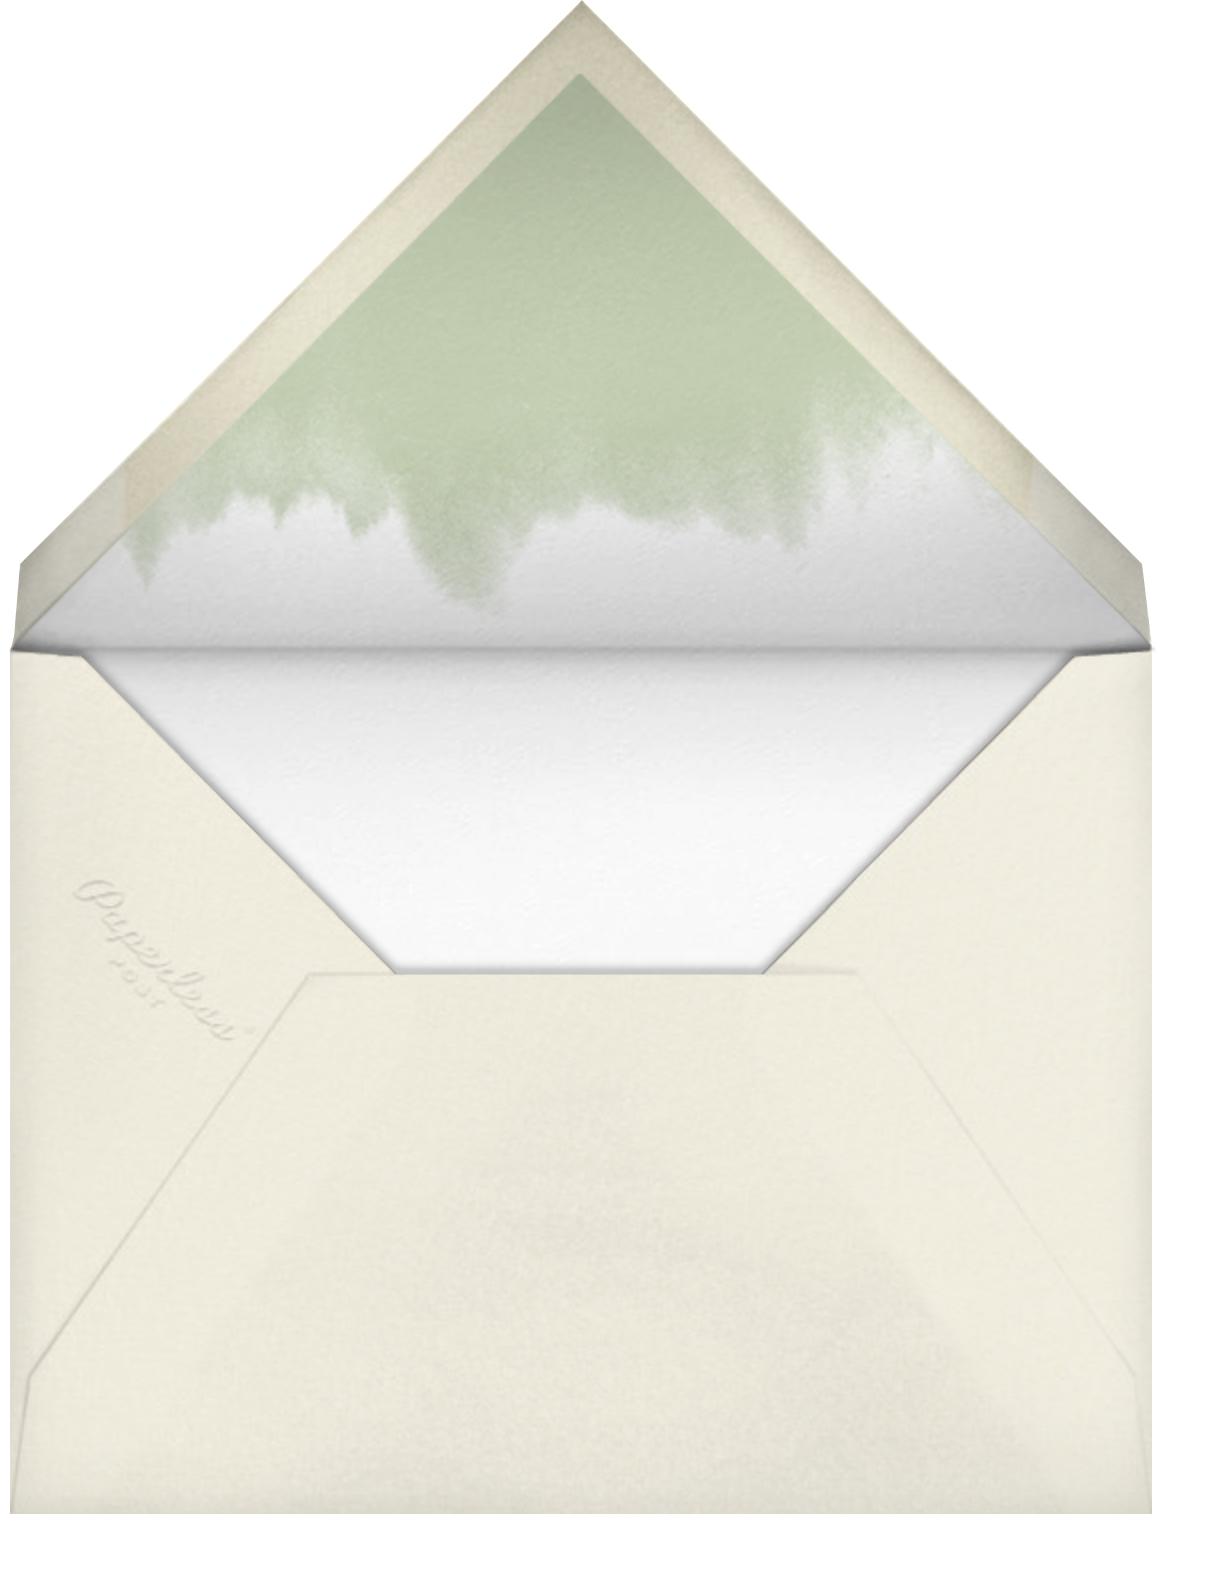 Saint Emilion - Paperless Post - Envelope